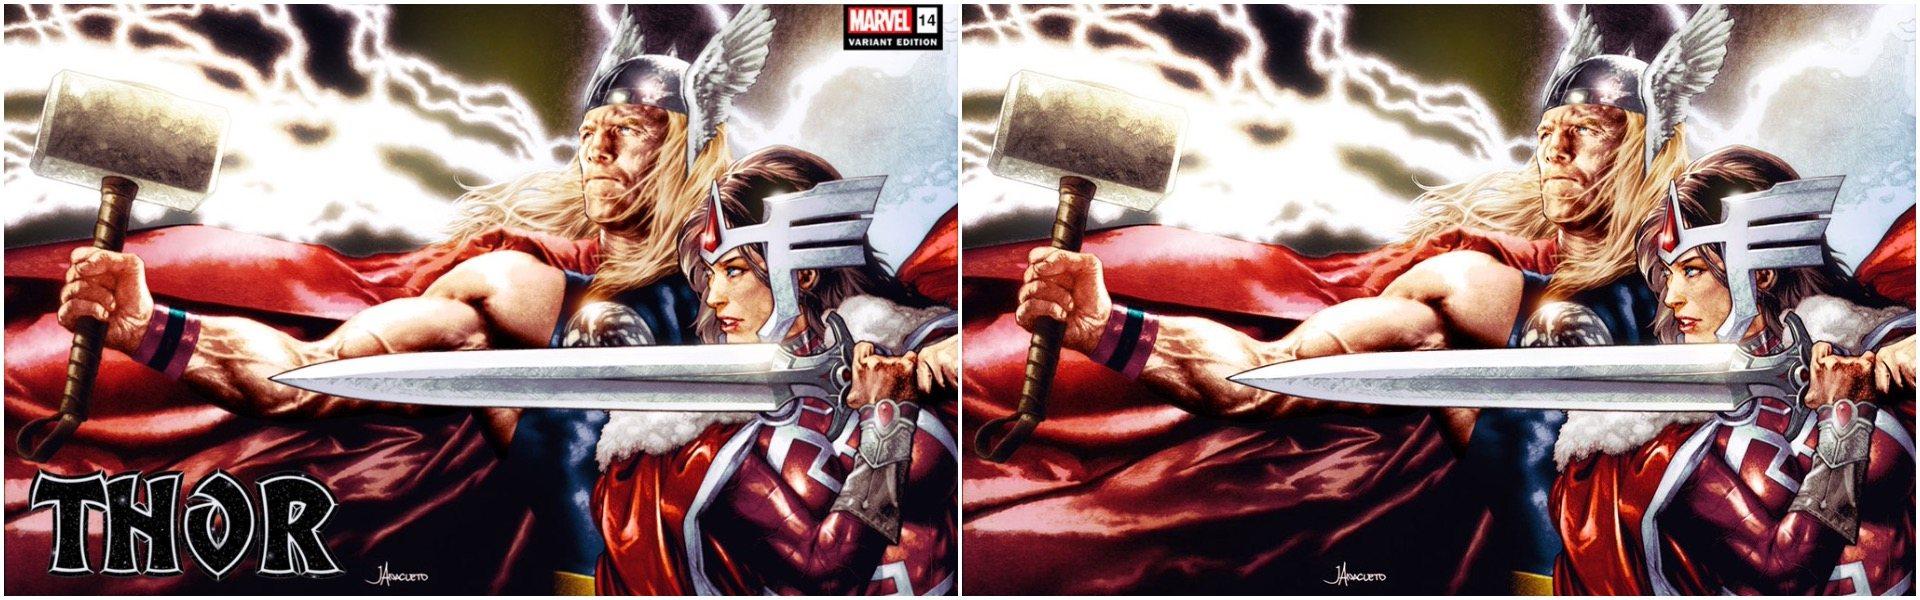 Thor #14 Jay Anacleto Wraparound Variants